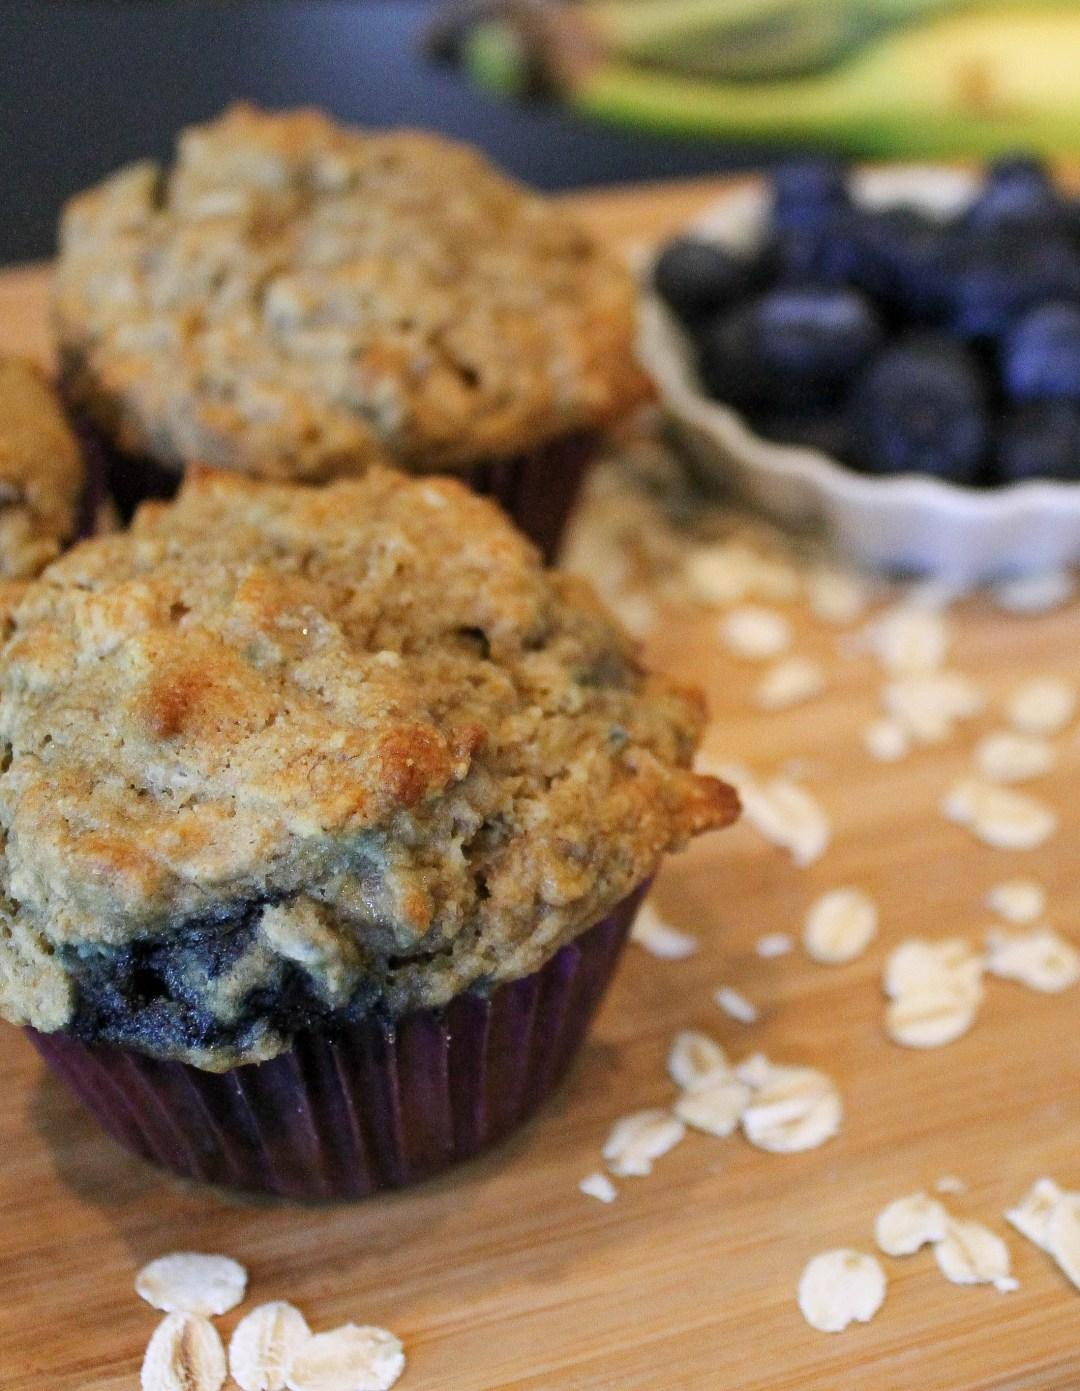 Banana Blueberry Oatmeal Muffins on wood cutting board